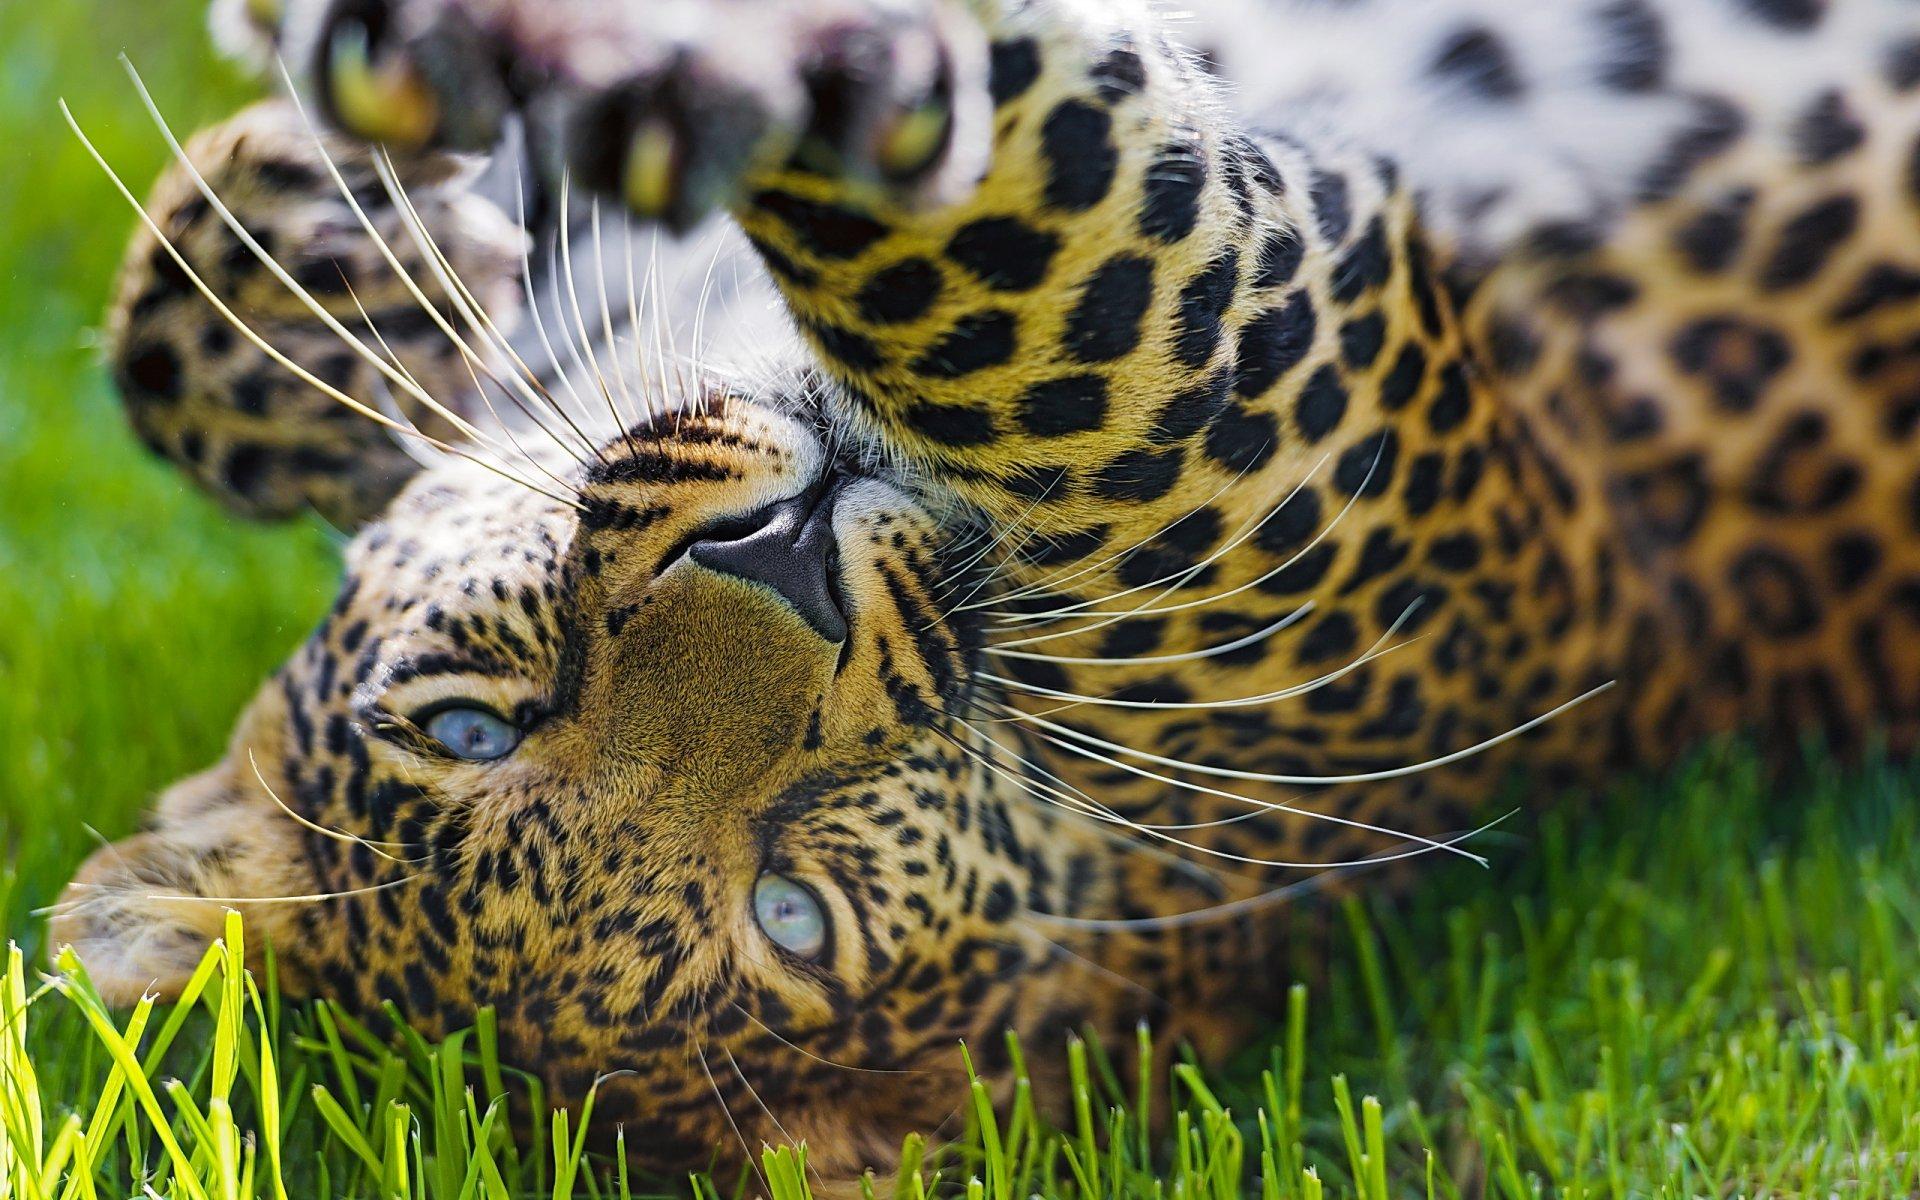 гостинку картинки на рабочий на телефон леопард врач акушер-гинеколог